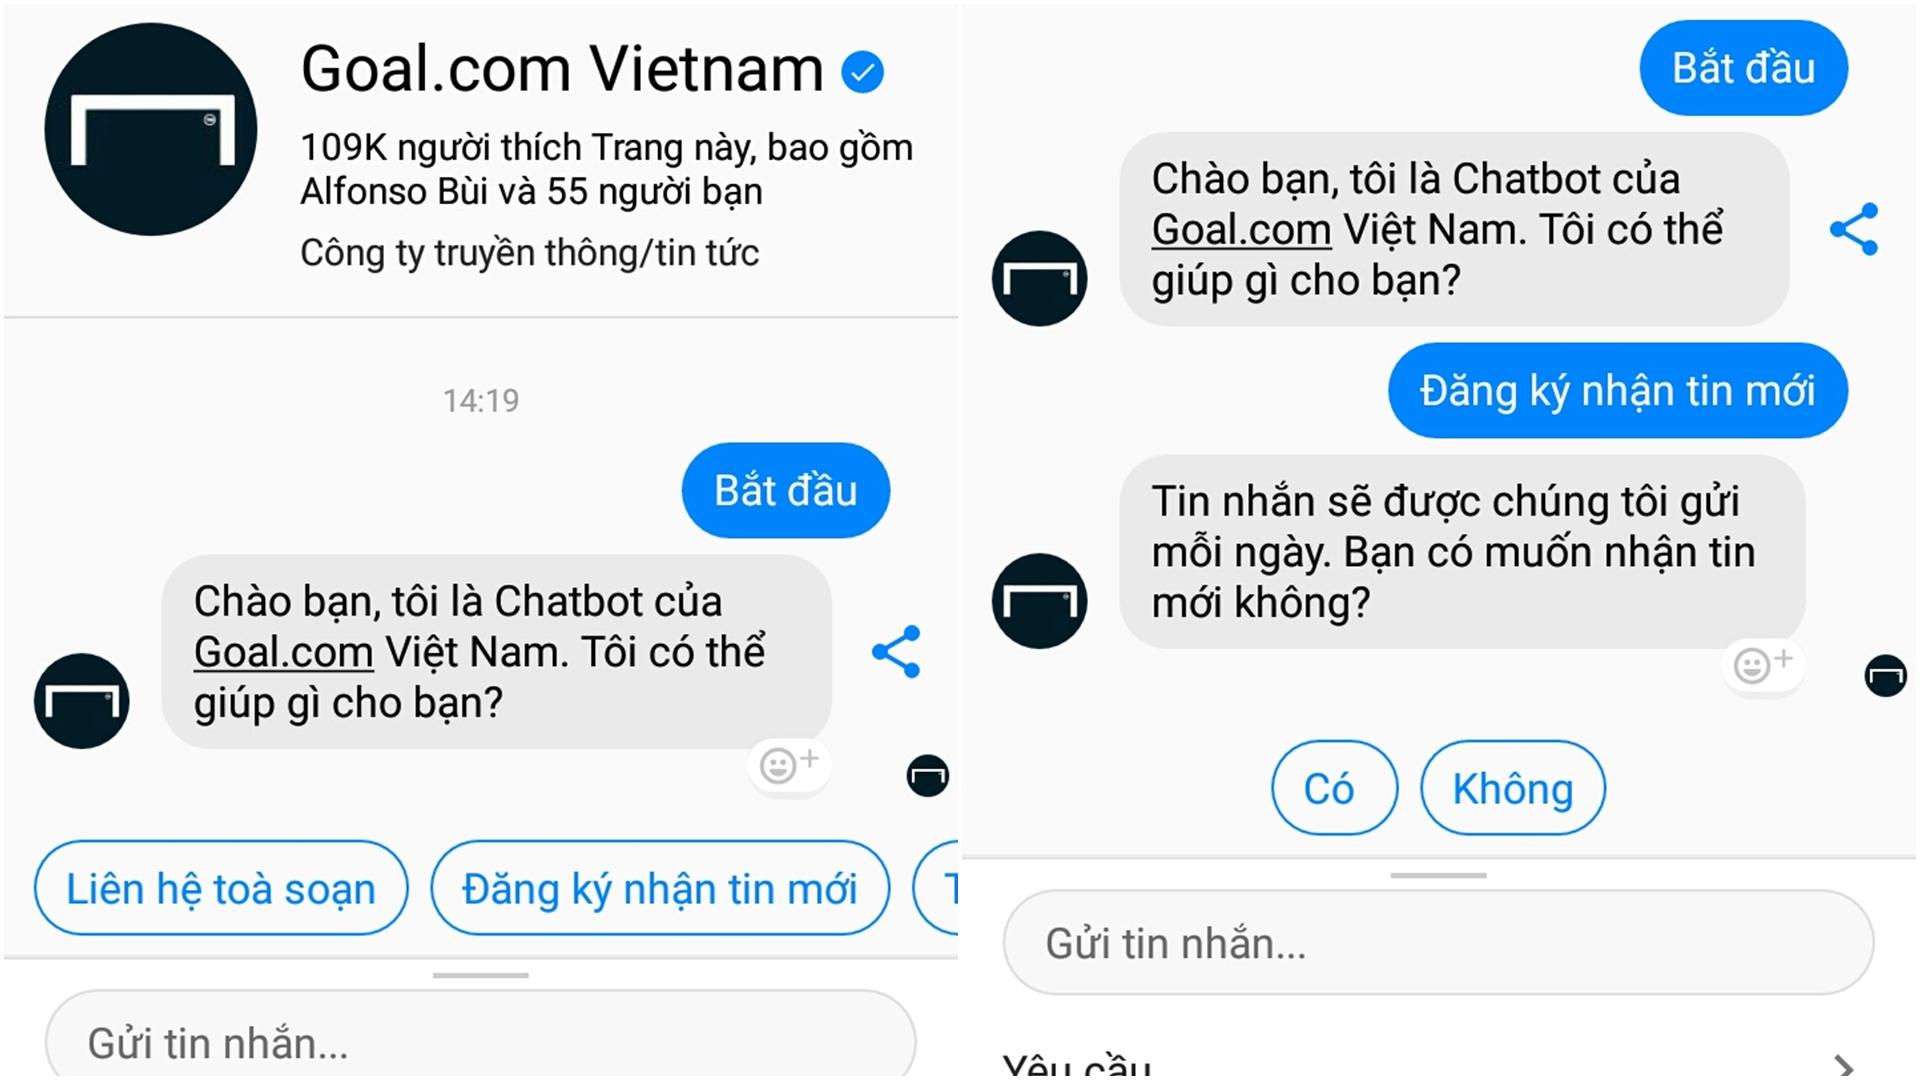 Goal.com Vietnam Chatbot